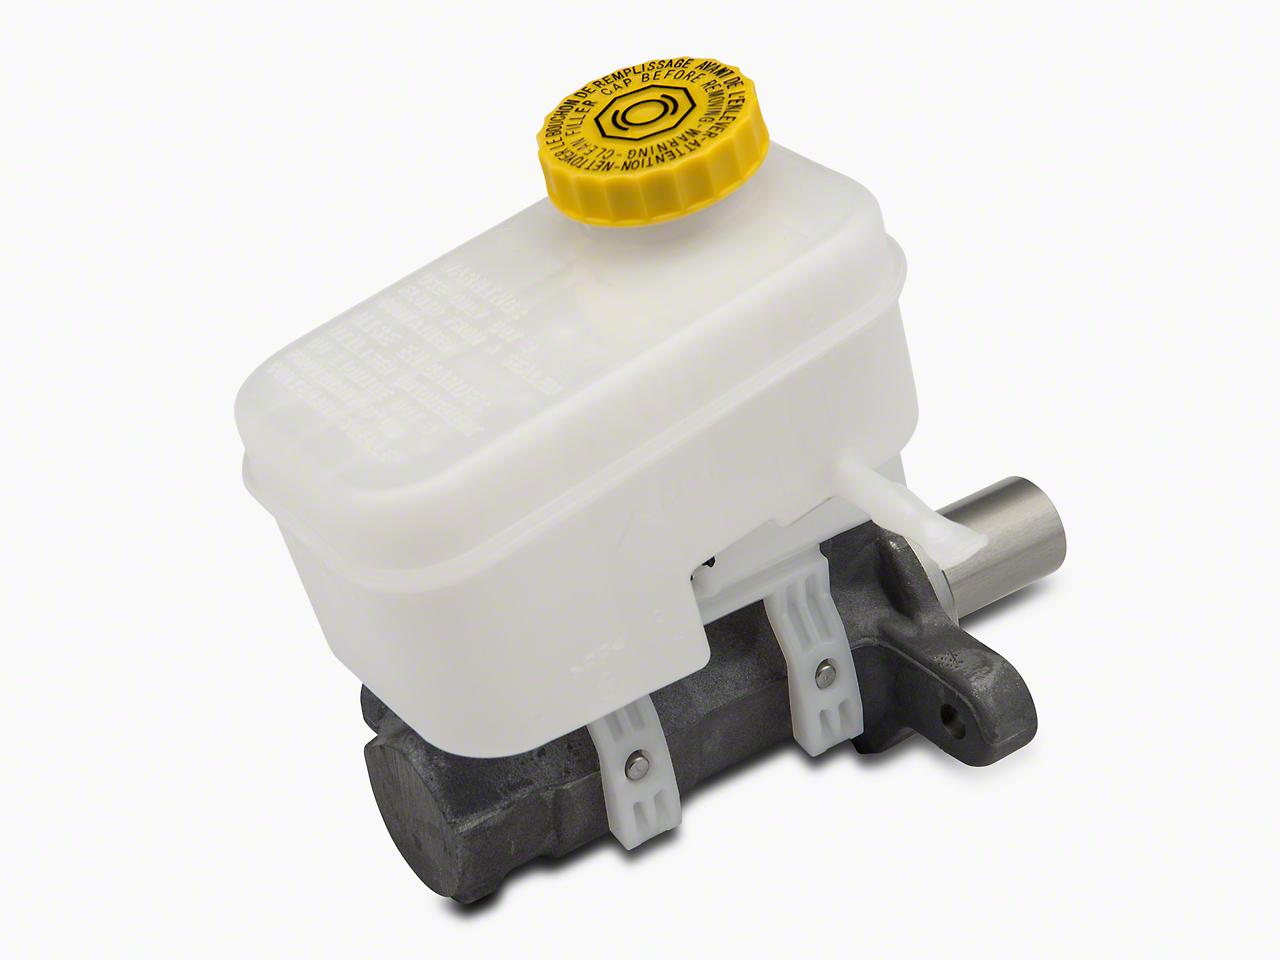 Teraflex Brake Master Cylinder w/oversized Bore (07-18 Jeep Wrangler JK)